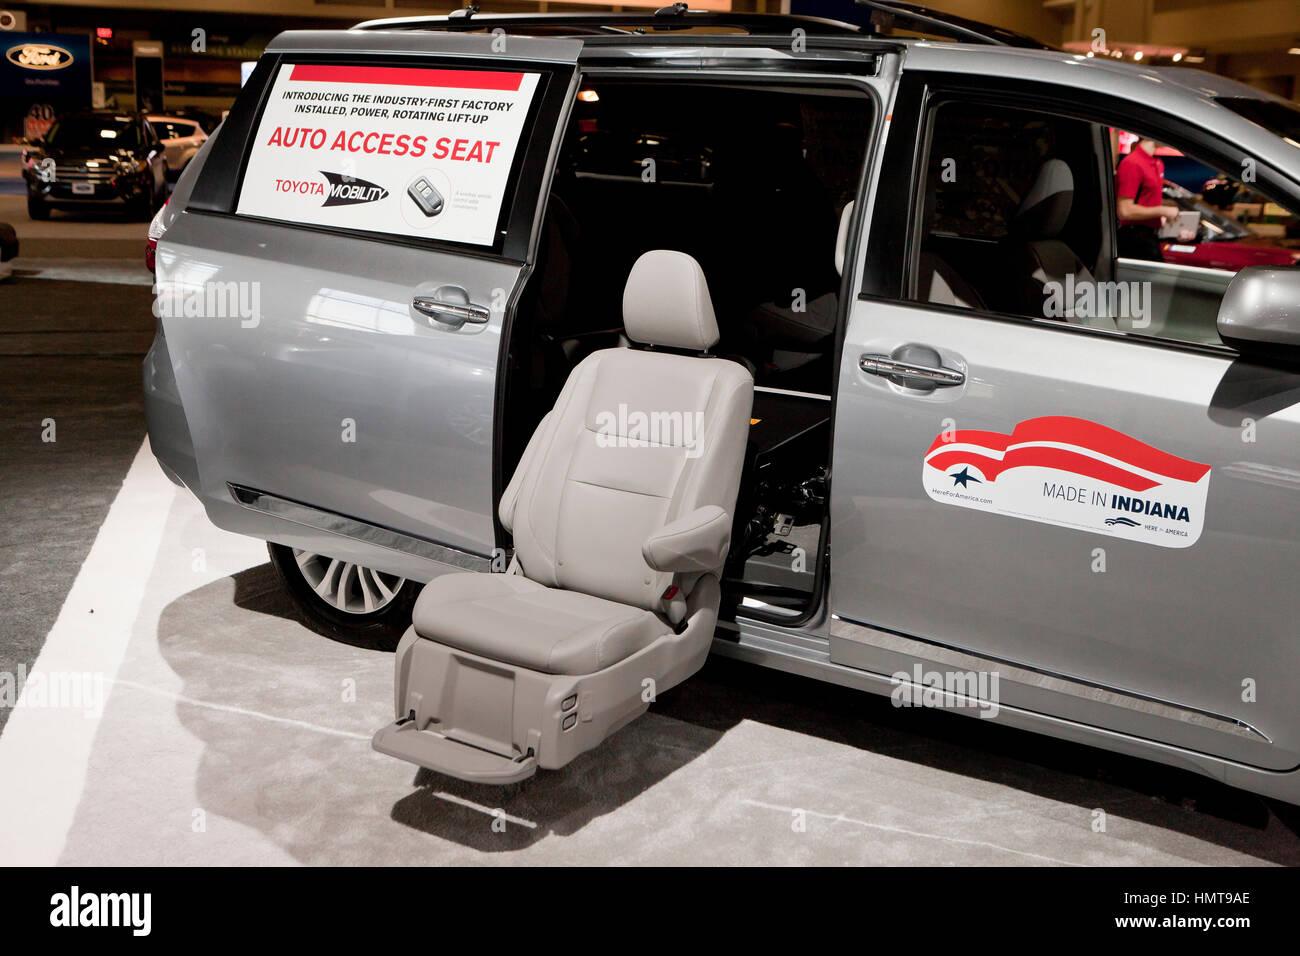 Toyota Mobilität Auto Zugang Sitz in Sienna Minivan auf 2017 Washington Auto Show - Washington, DC USA anzeigen Stockbild